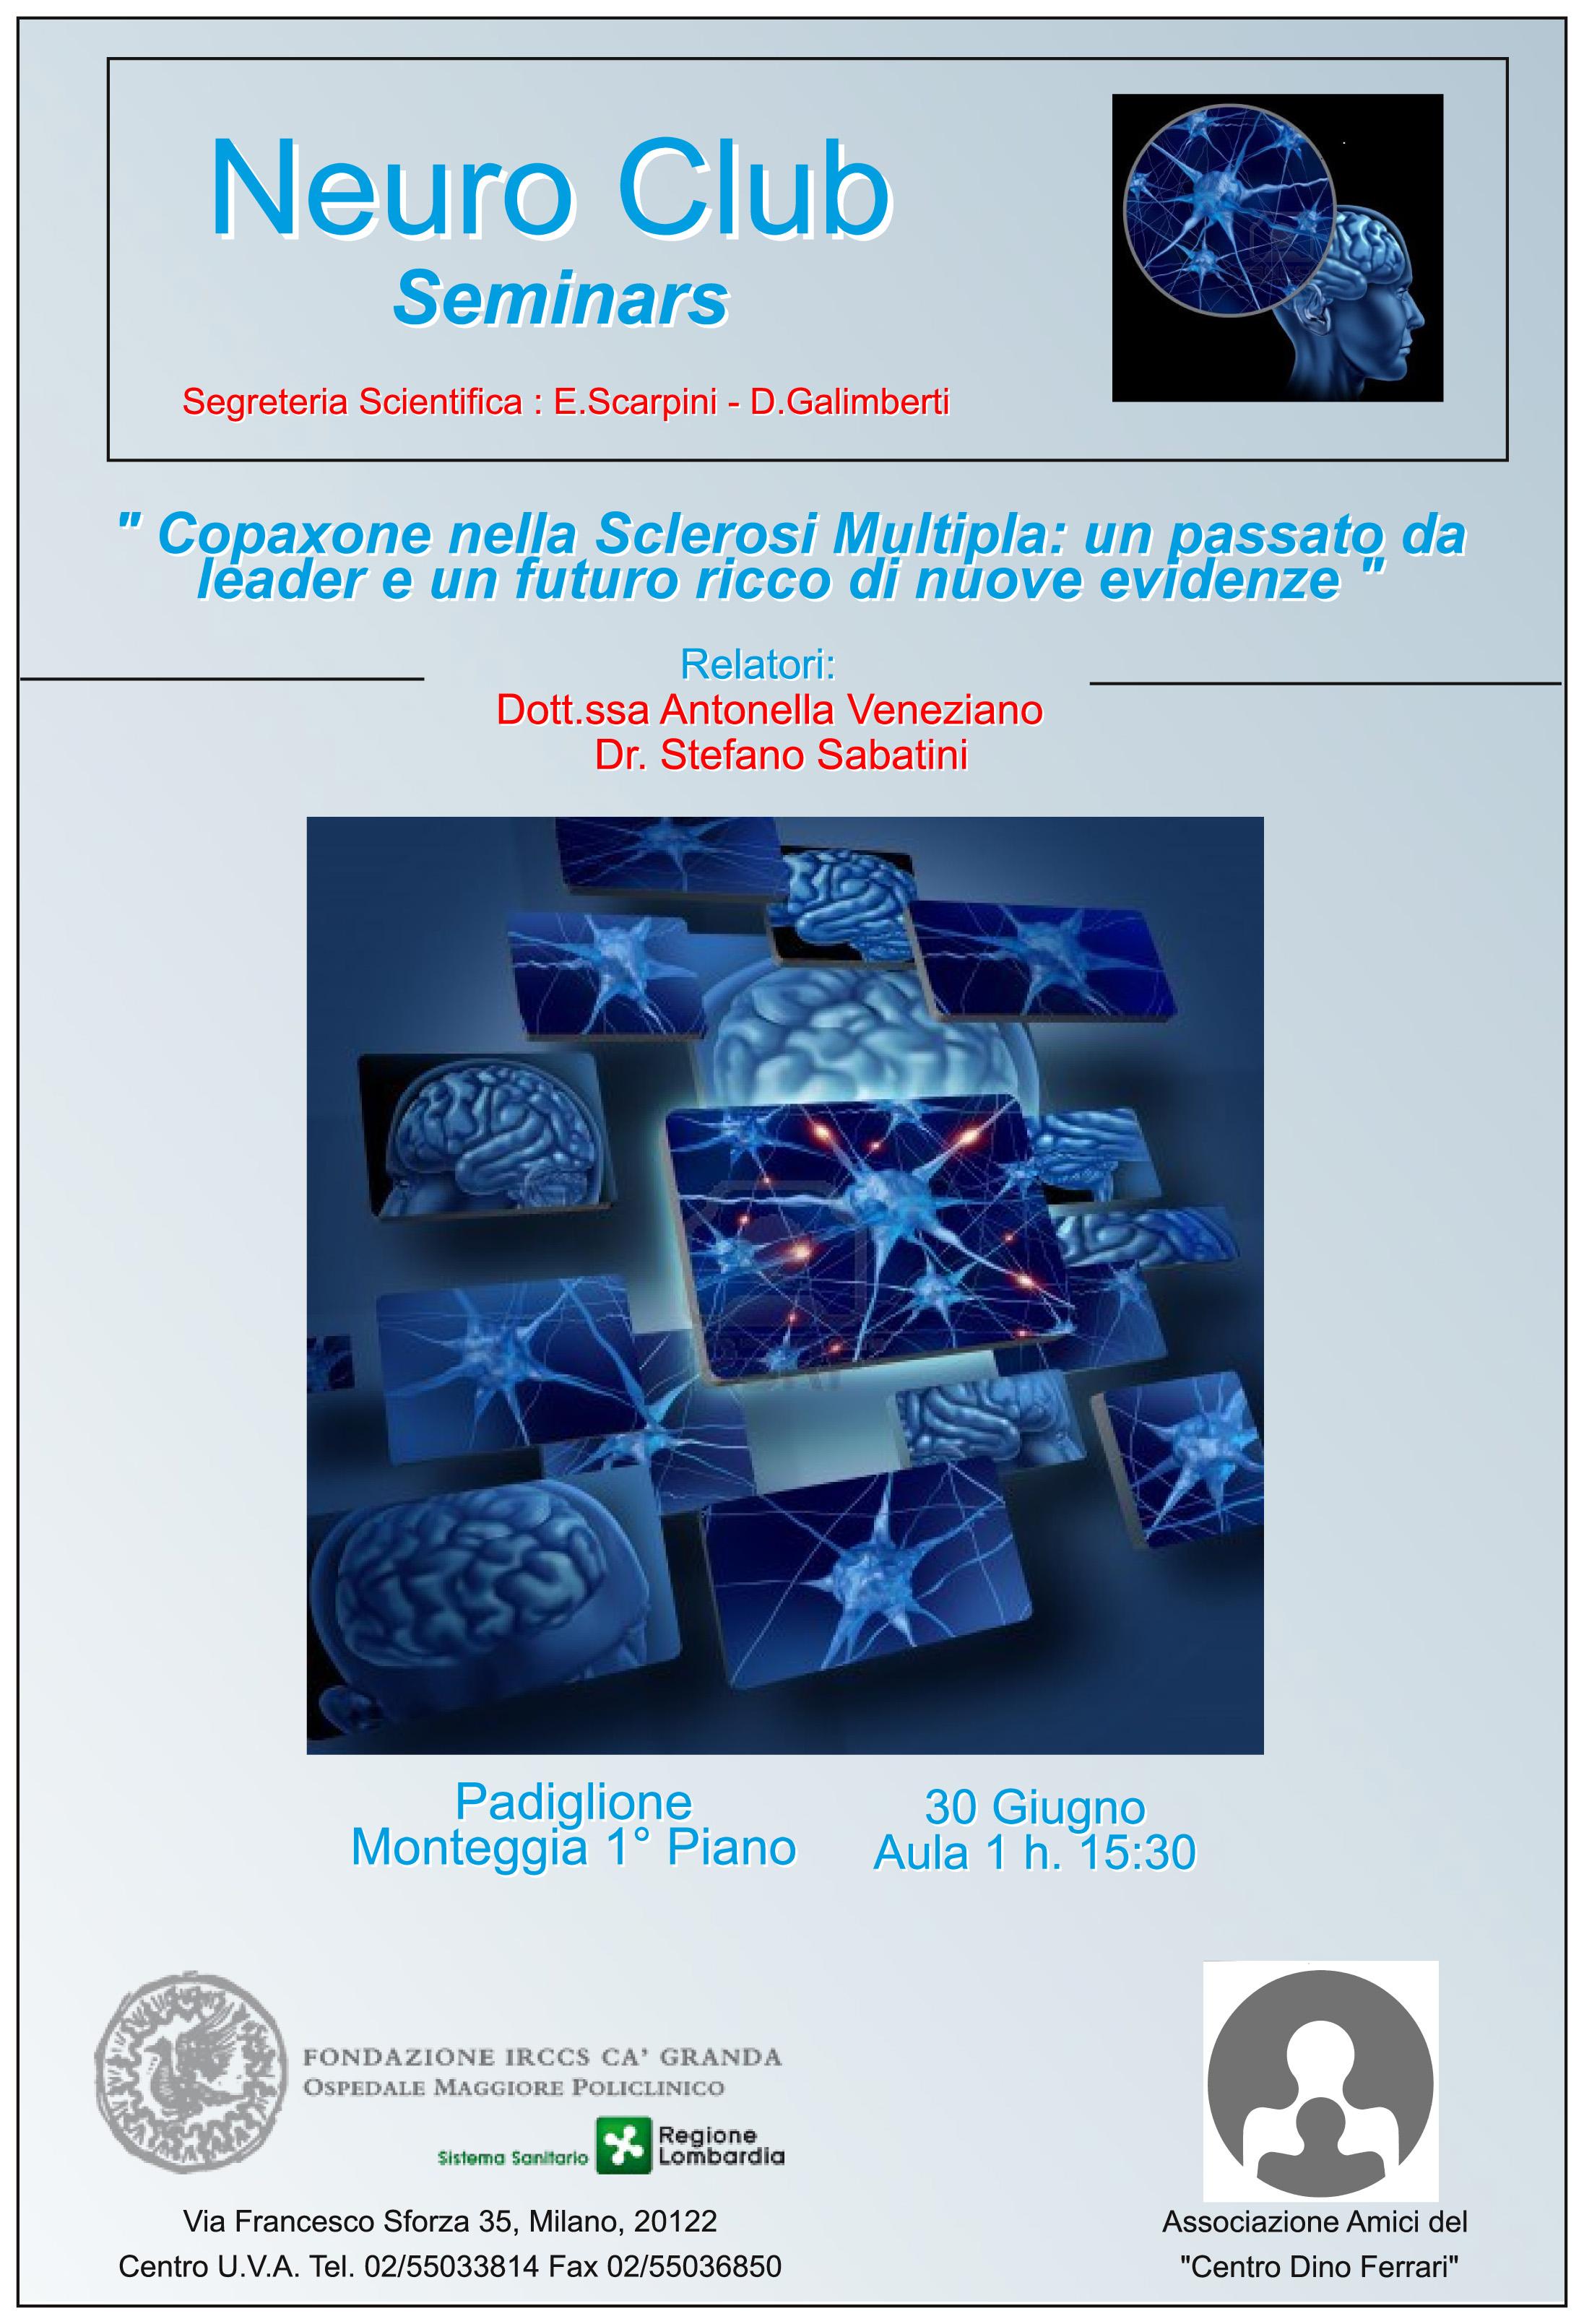 evento sclerosi multipla 27 -06 -14